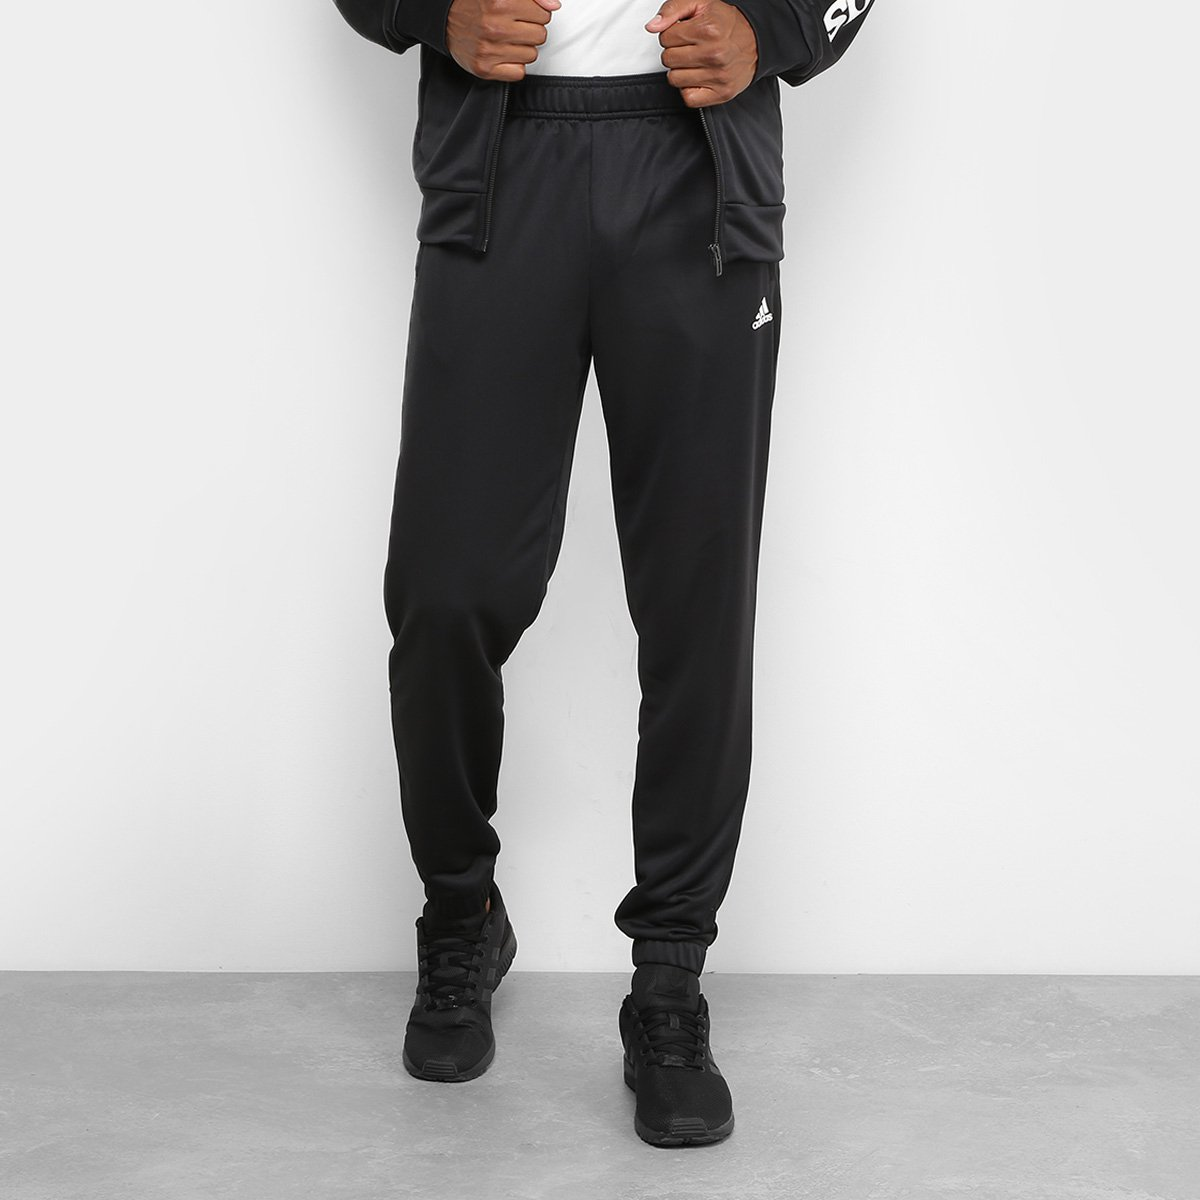 Agasalho Adidas Mts Pes Marker Masculino - Compre Agora  debb8cbd0a5af